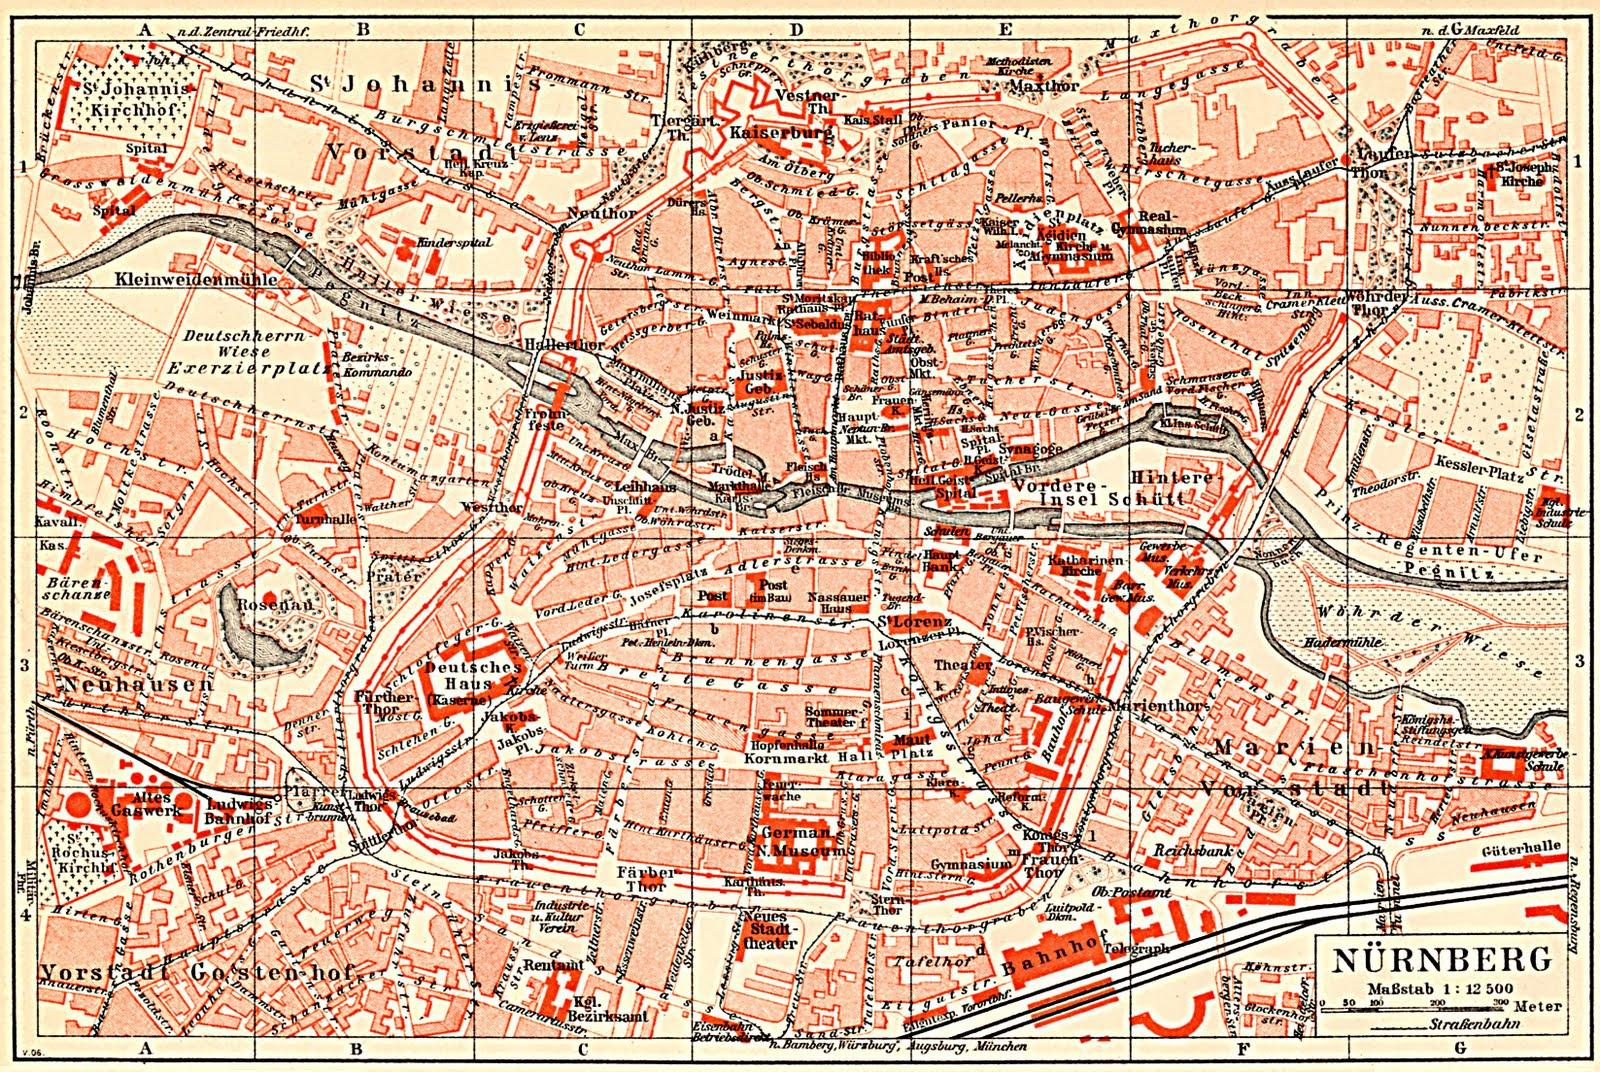 City map Nurnberg